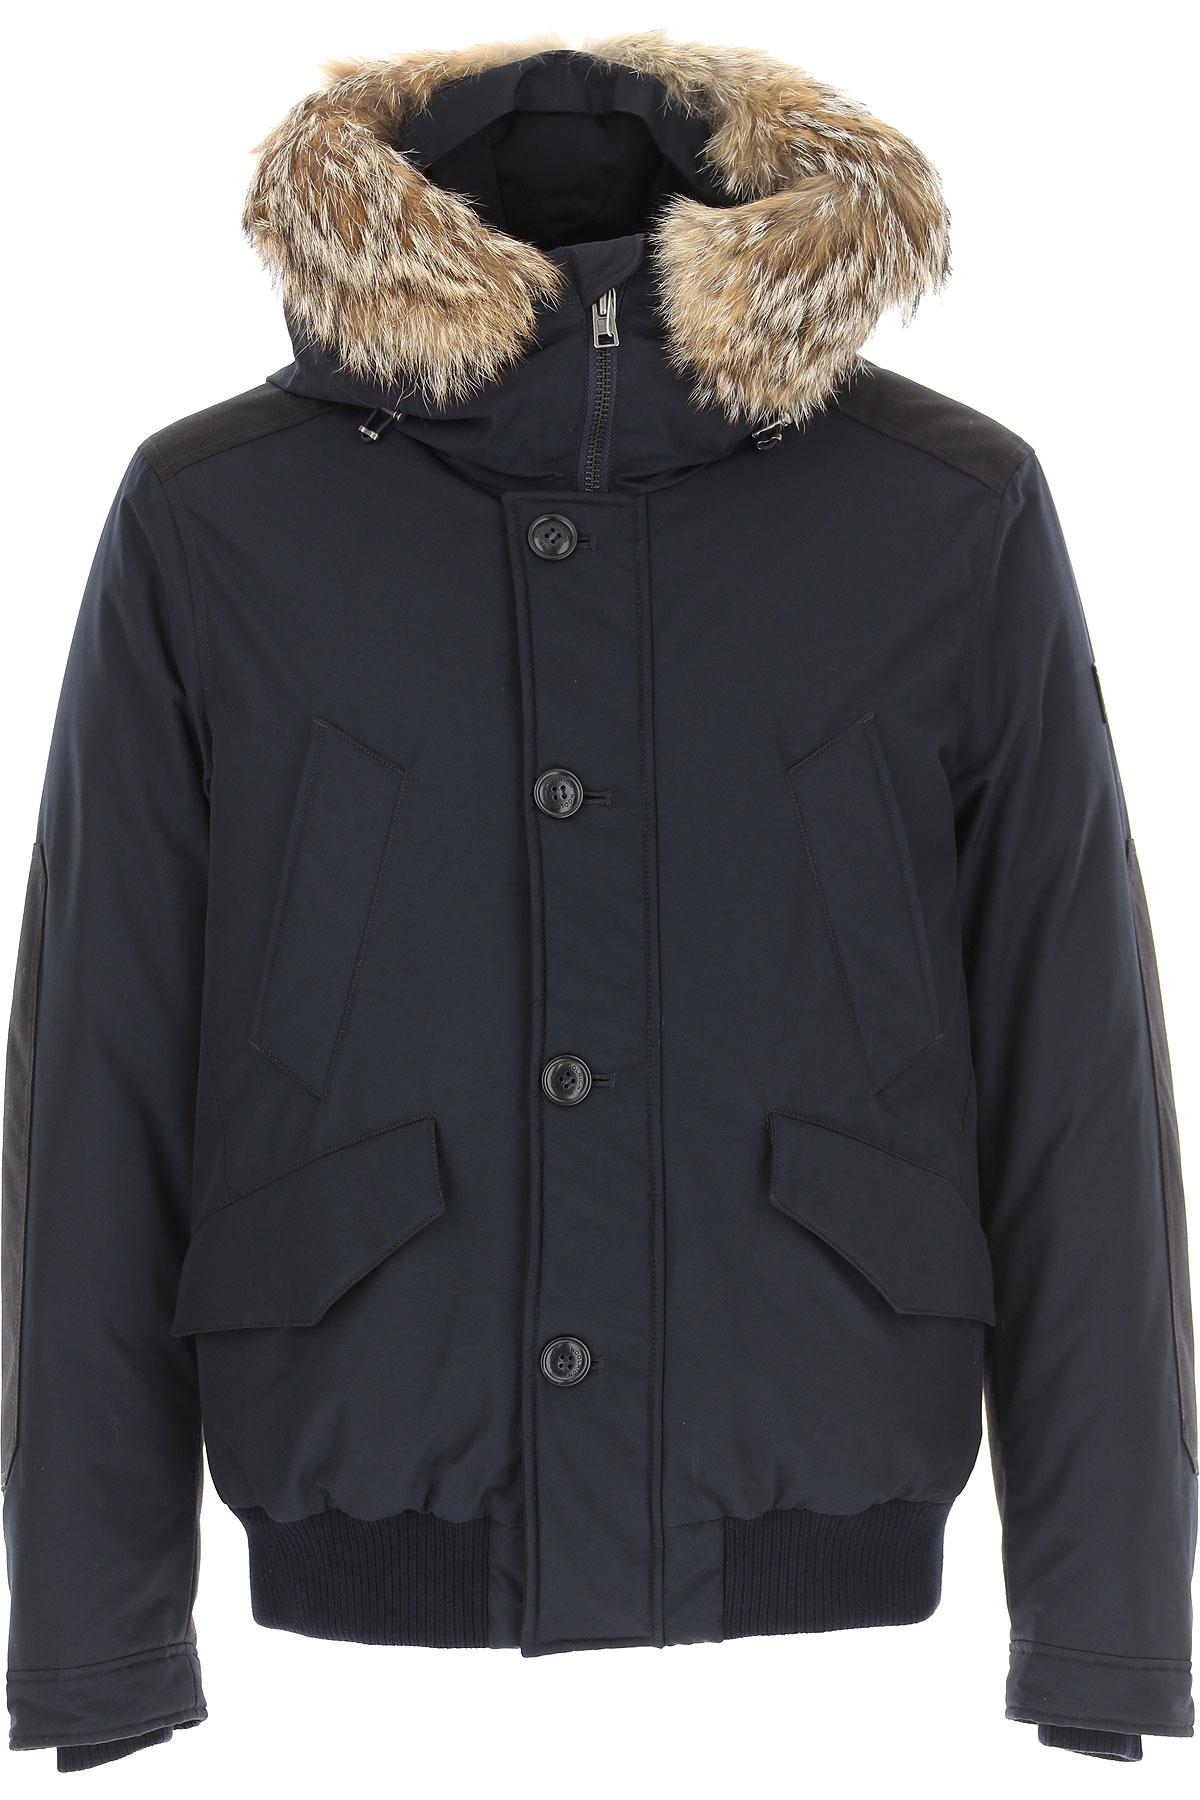 Woolrich Down Jacket for Men, Puffer Ski Jacket On Sale, Midnight Blue, Down, 2019, L M S